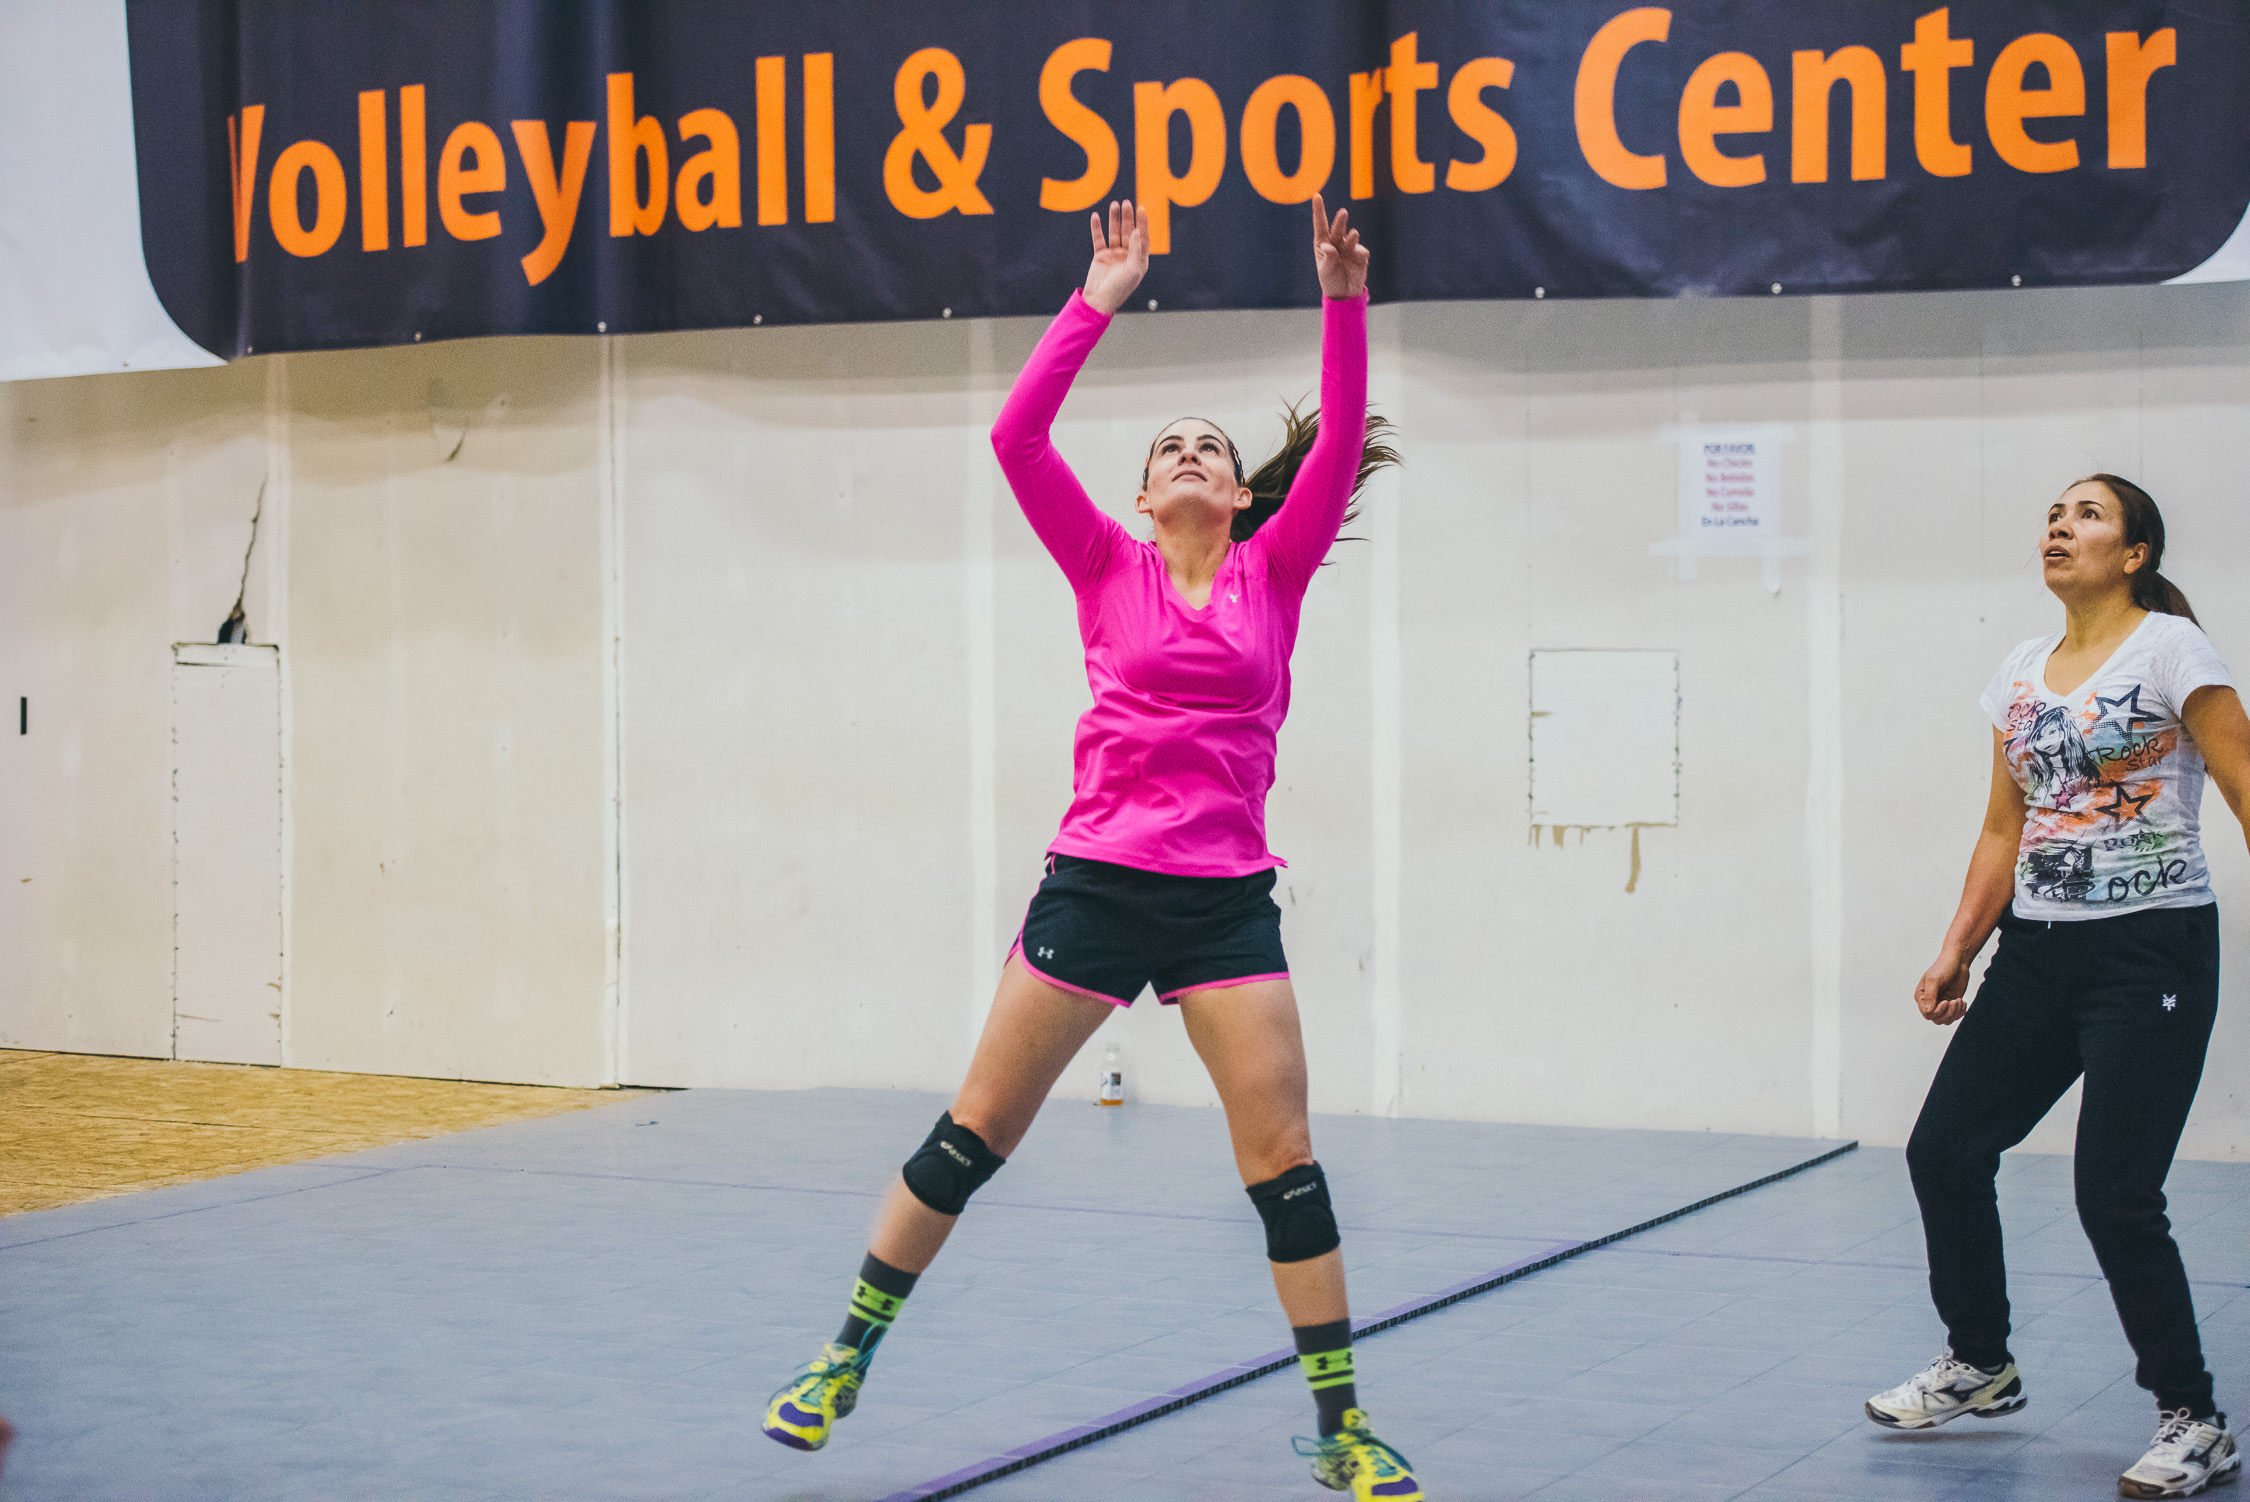 Sarah Jackson, founder of Casa de Paz and Volleyball Latino